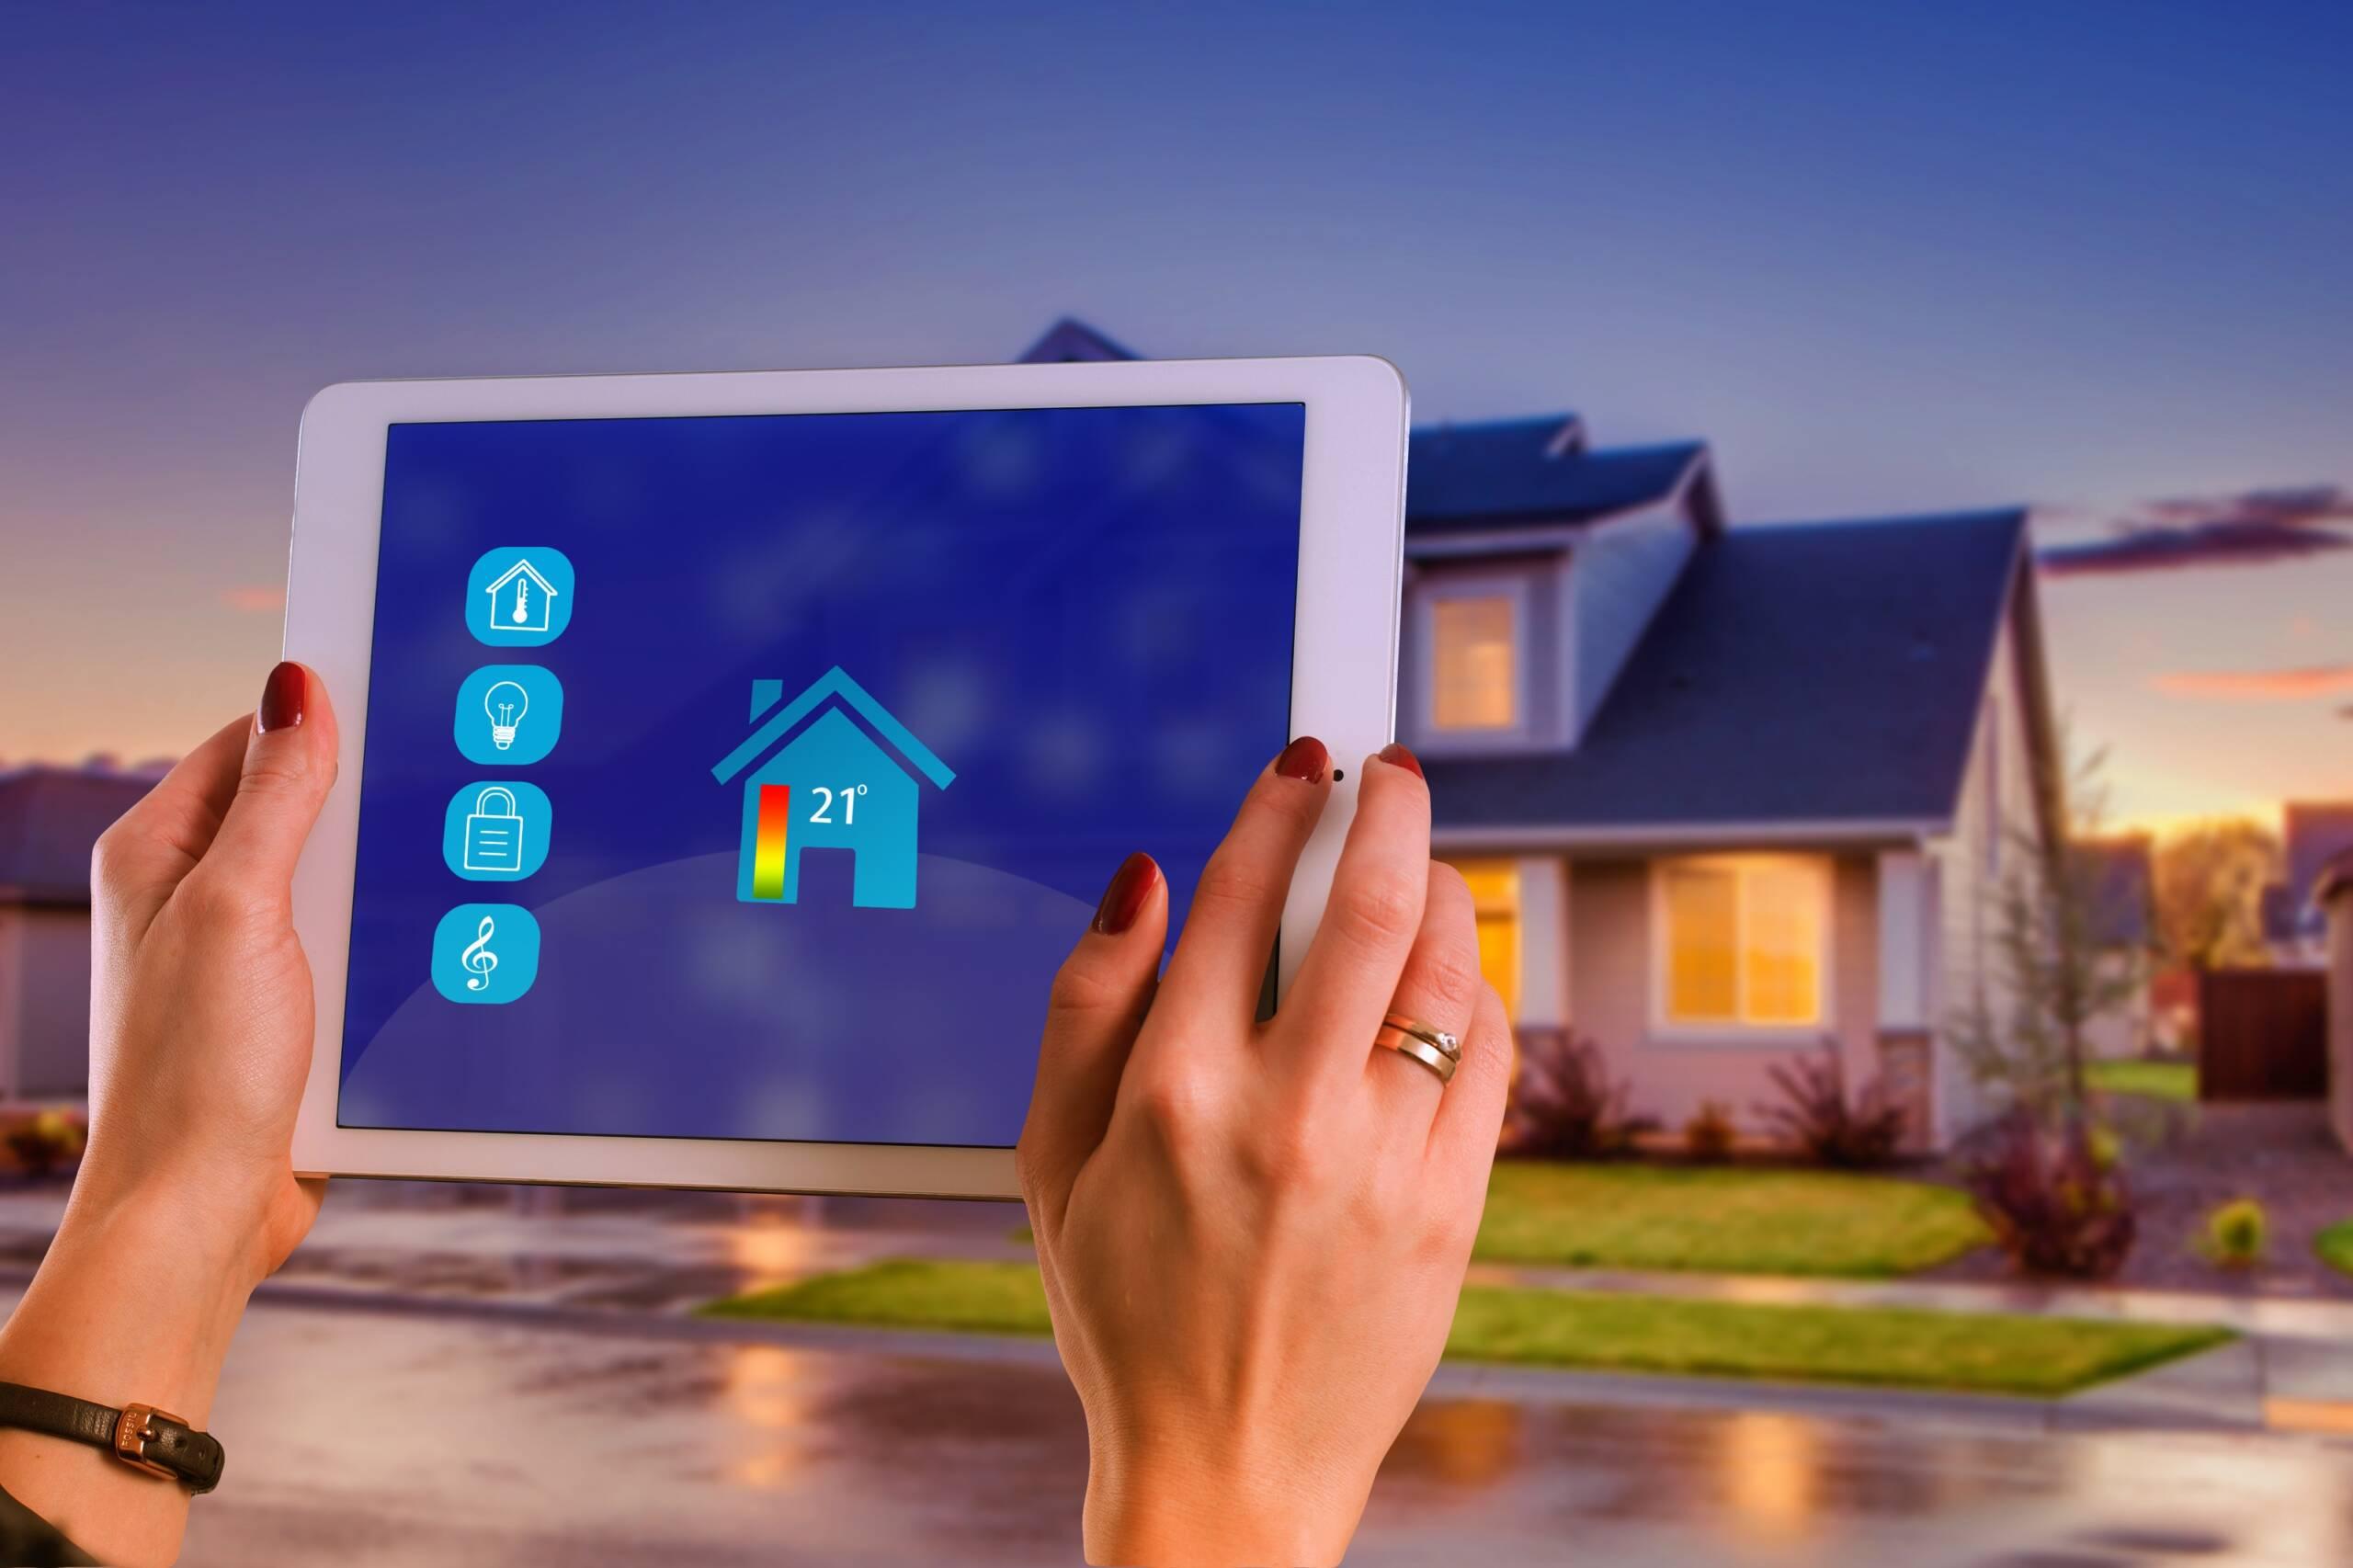 Ethics of Smart Home Technology